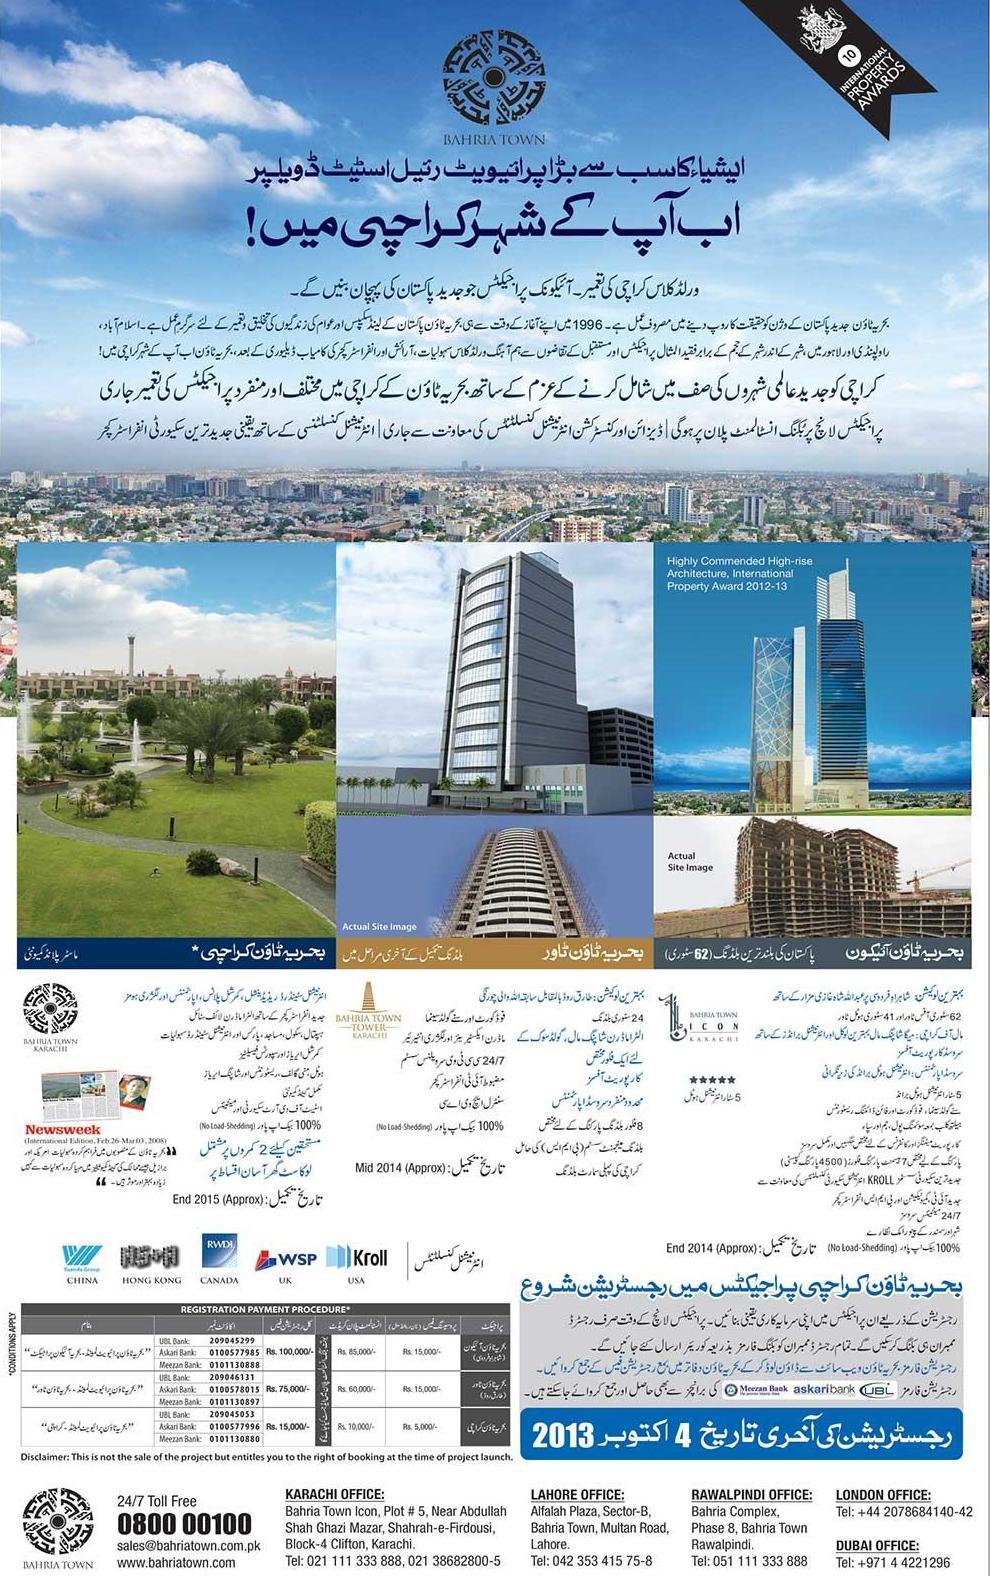 Bahria Town Karachi membership registration starts